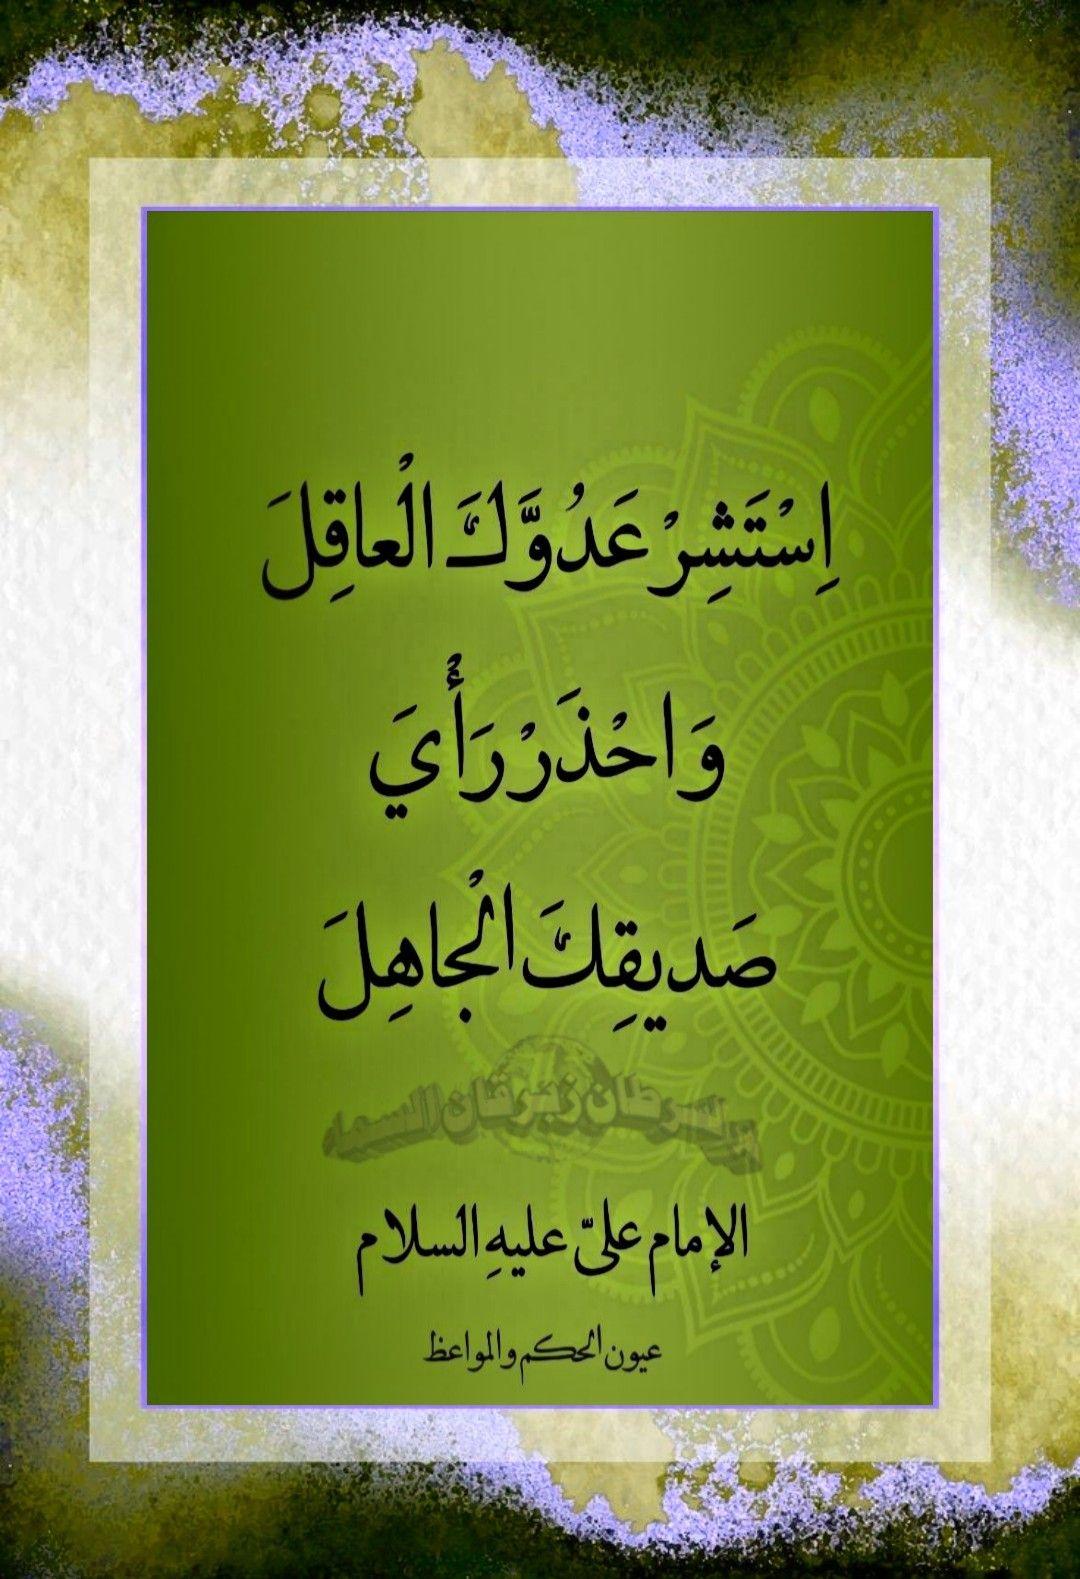 Pin By صياح الحمصي On الإمام علي عليه السلام Islam Hadith Hadith Book Cover